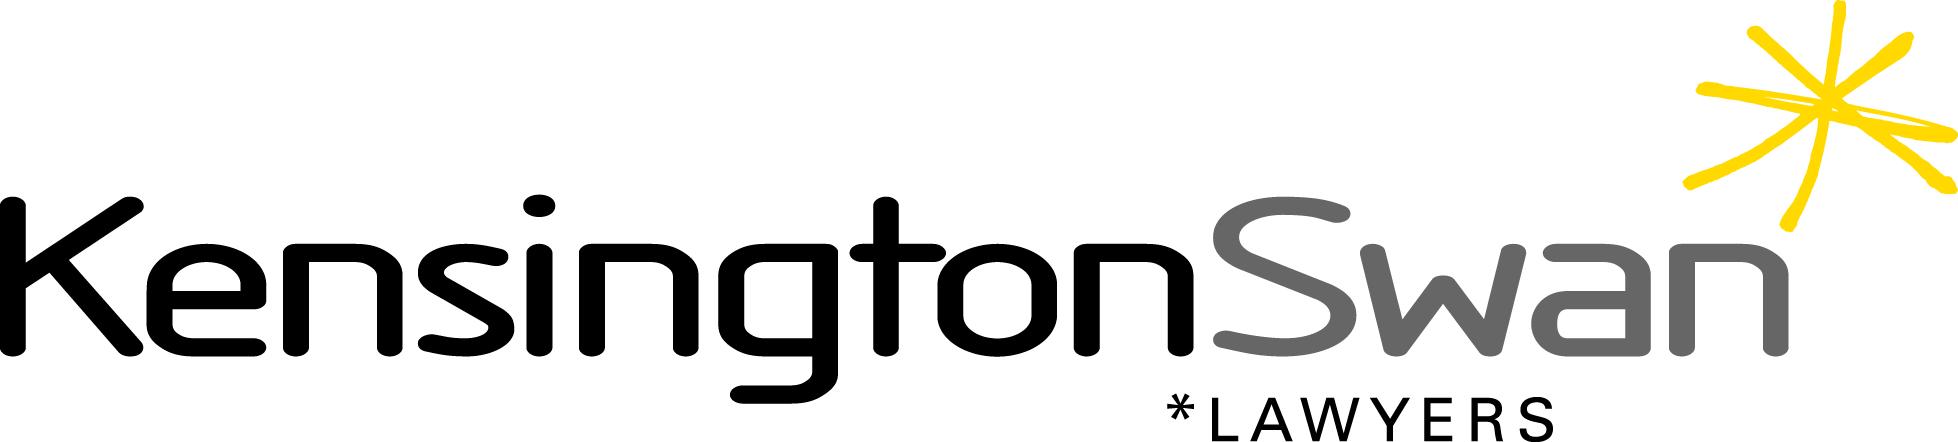 Kensington Swan logo - The Gift Trust Testimonials